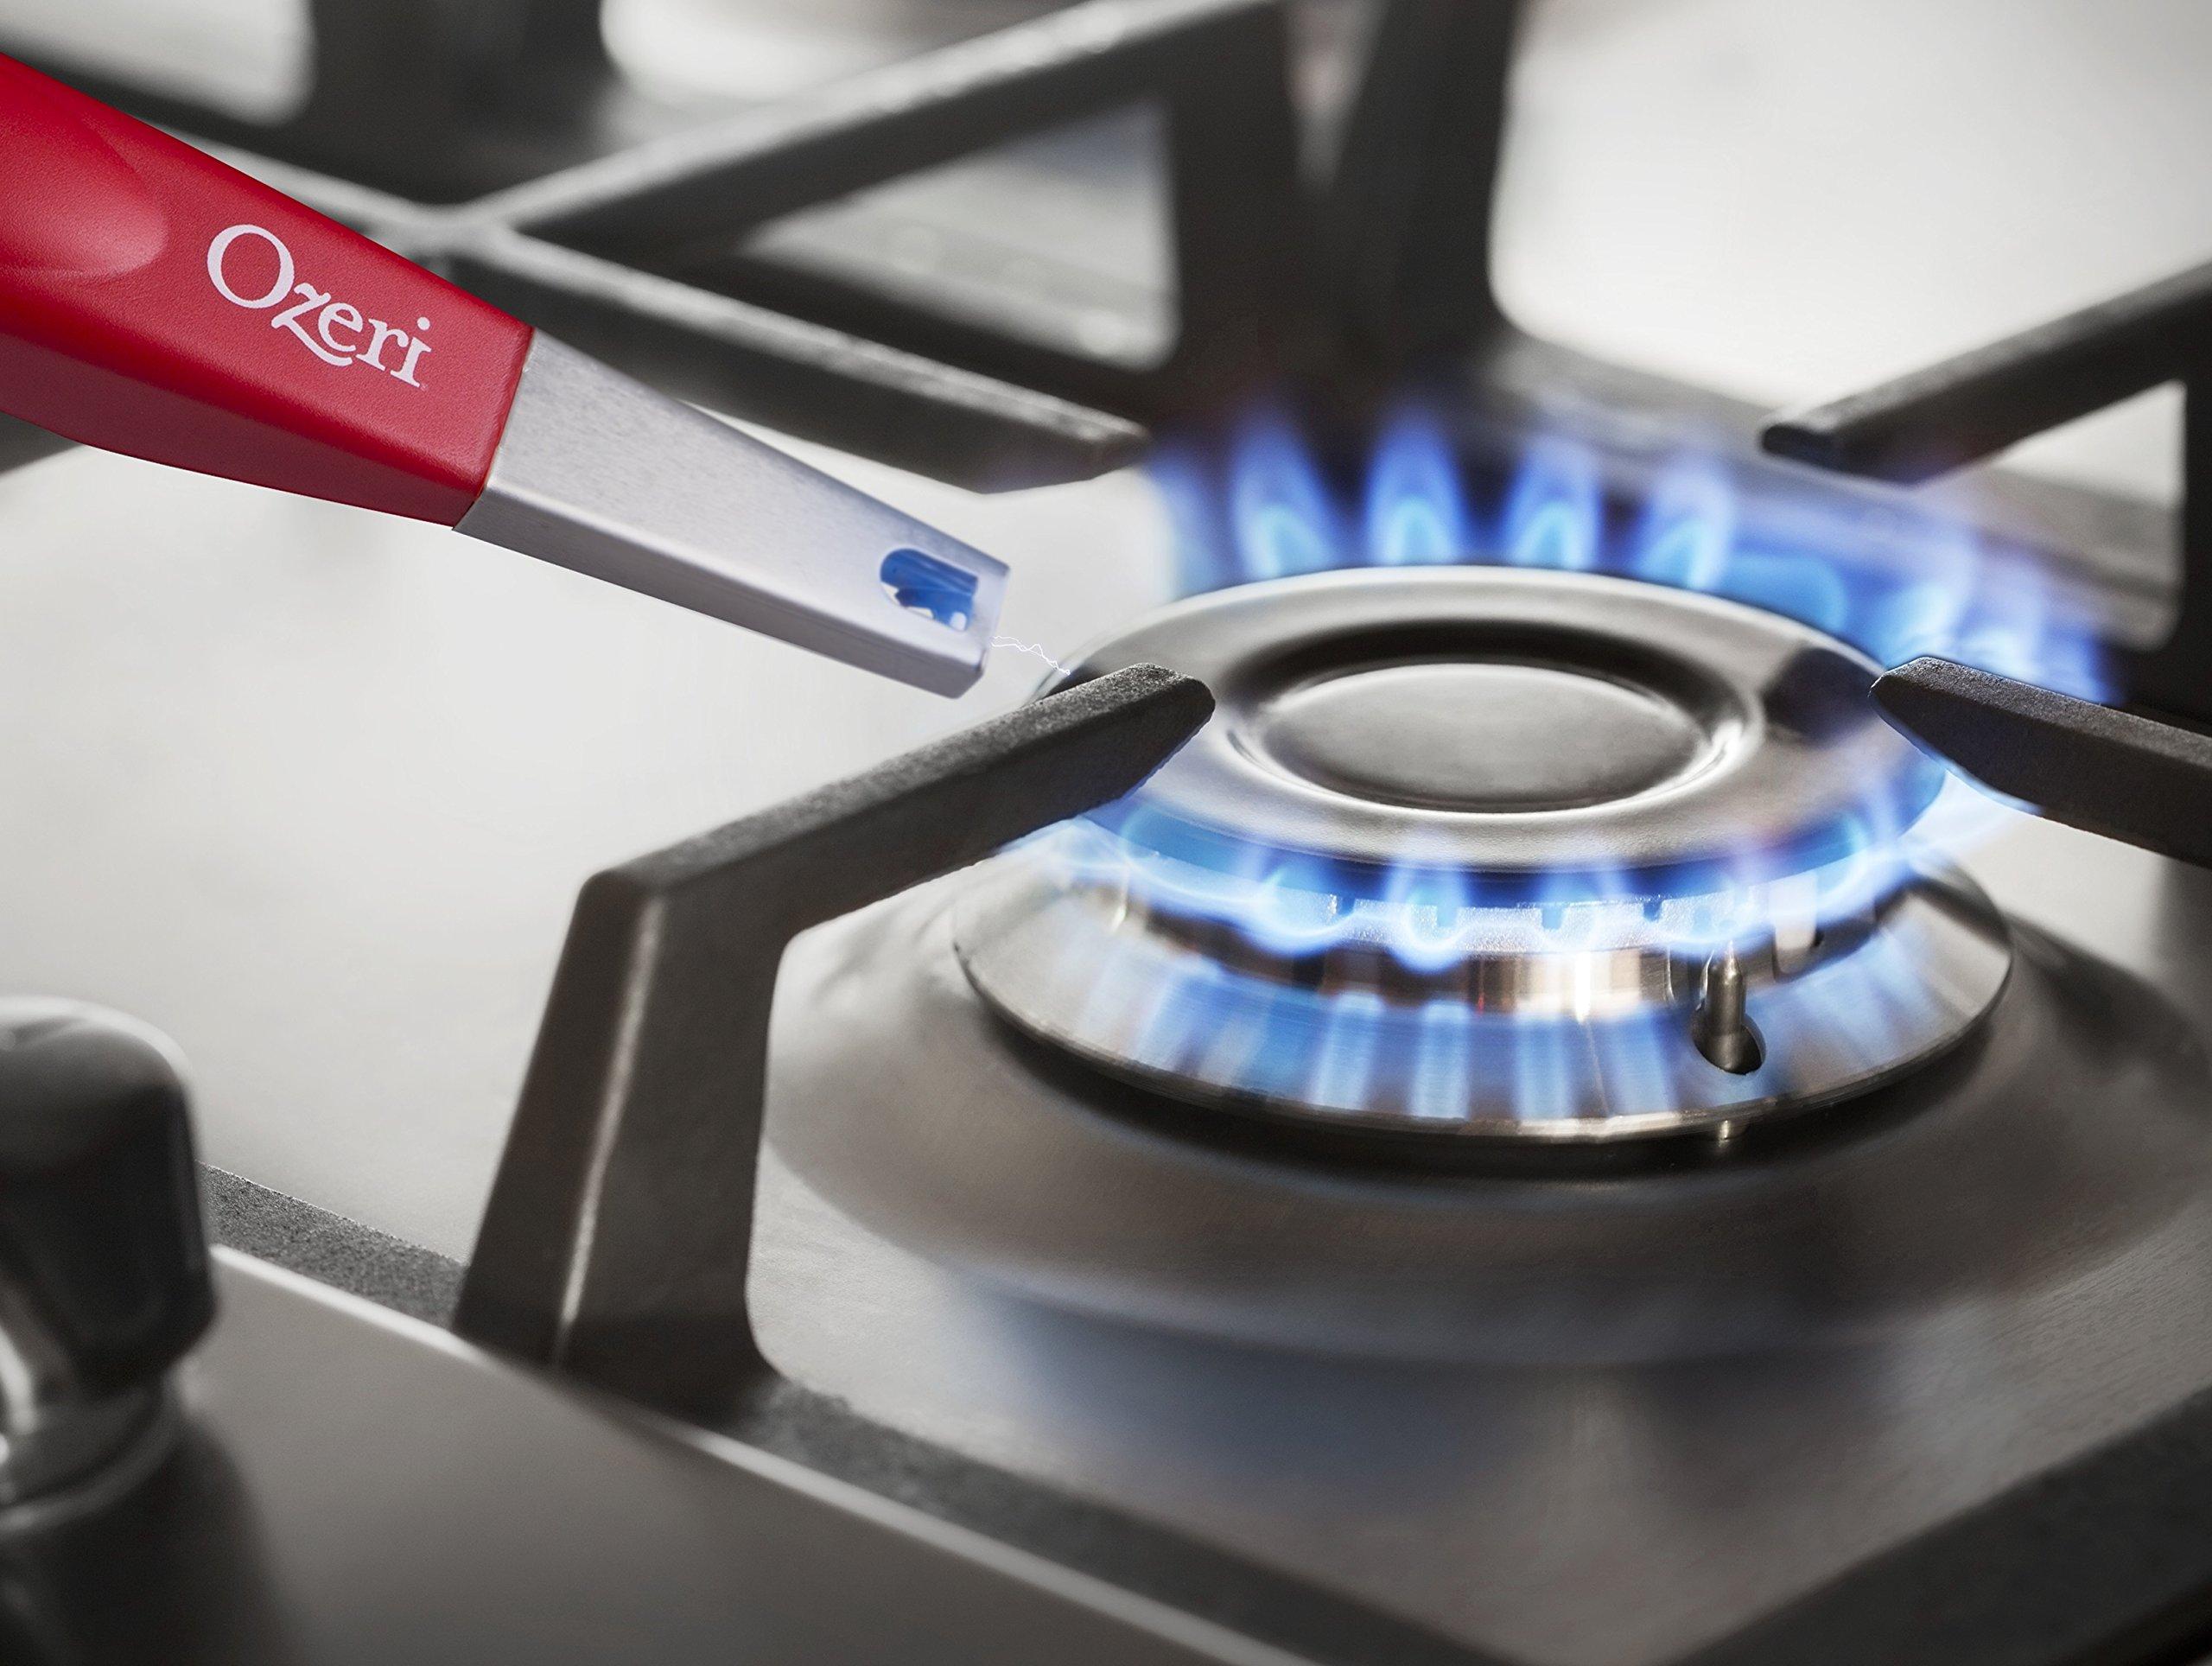 Galleon ozeri opl r piezoelectric kitchen stove lighter for Kitchen set toys r us philippines